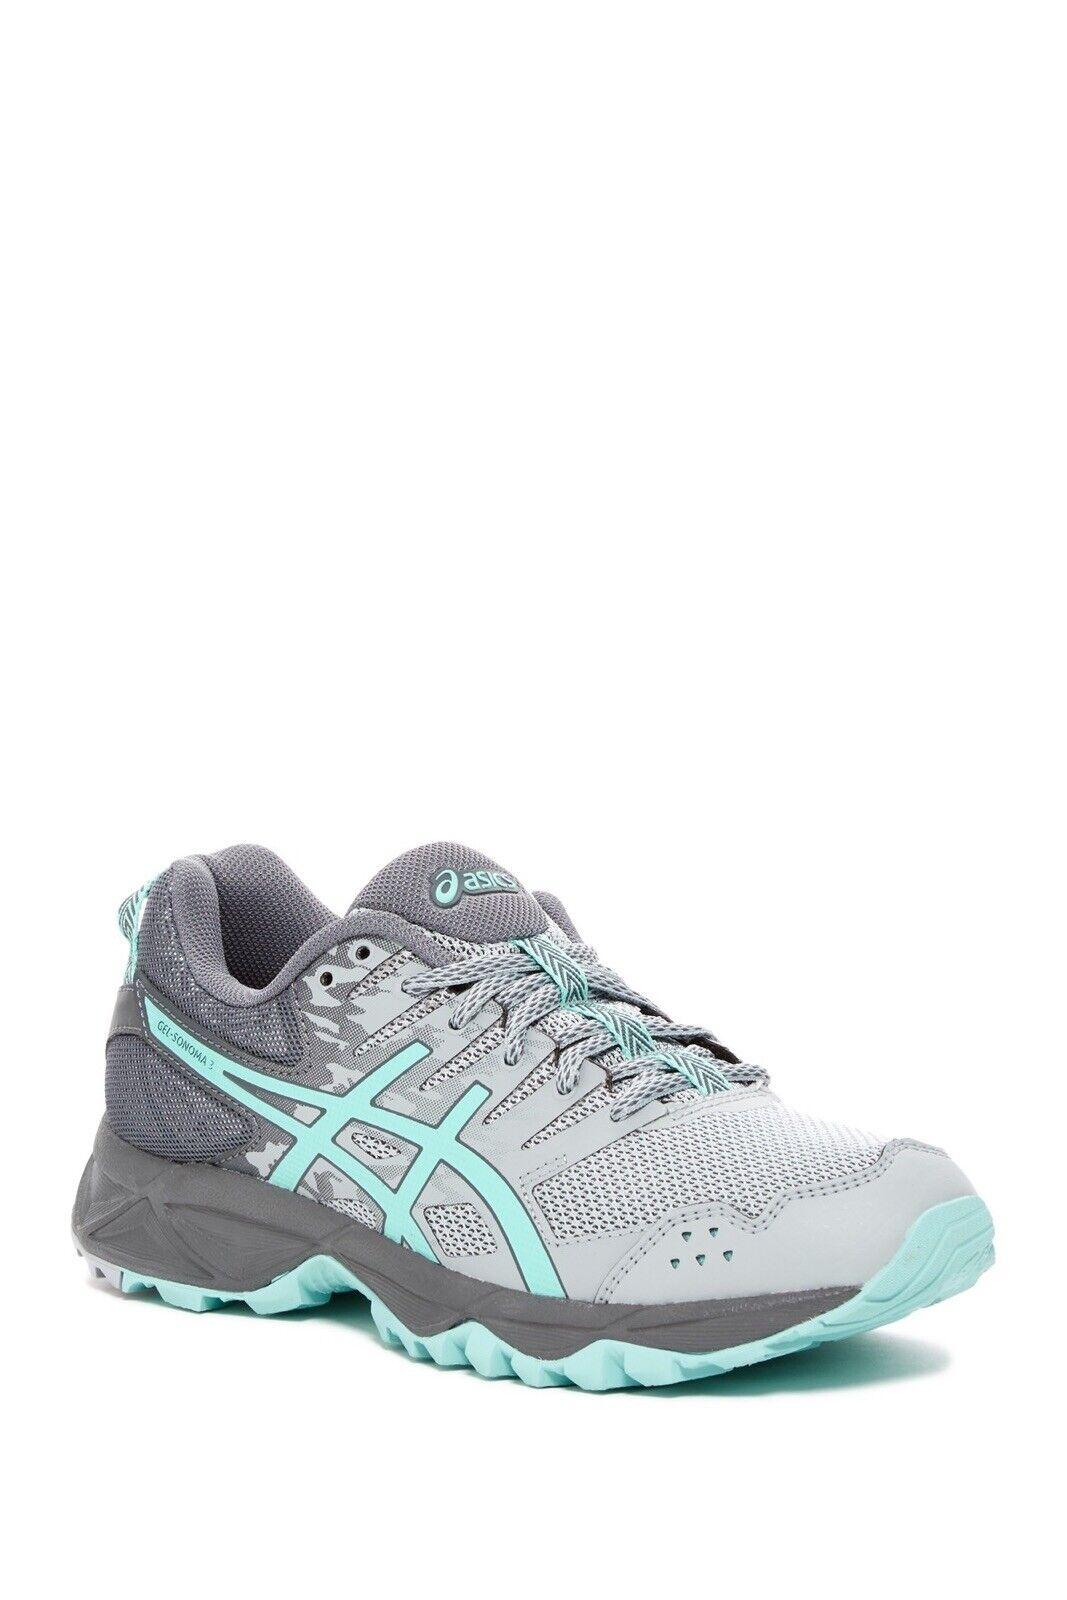 80 NWT ASICS 65533;C GEL -Sonoma 3  donna Hiking Trail scarpe da ginnastica Midgrigio -aqua Sz 7  negozio d'offerta